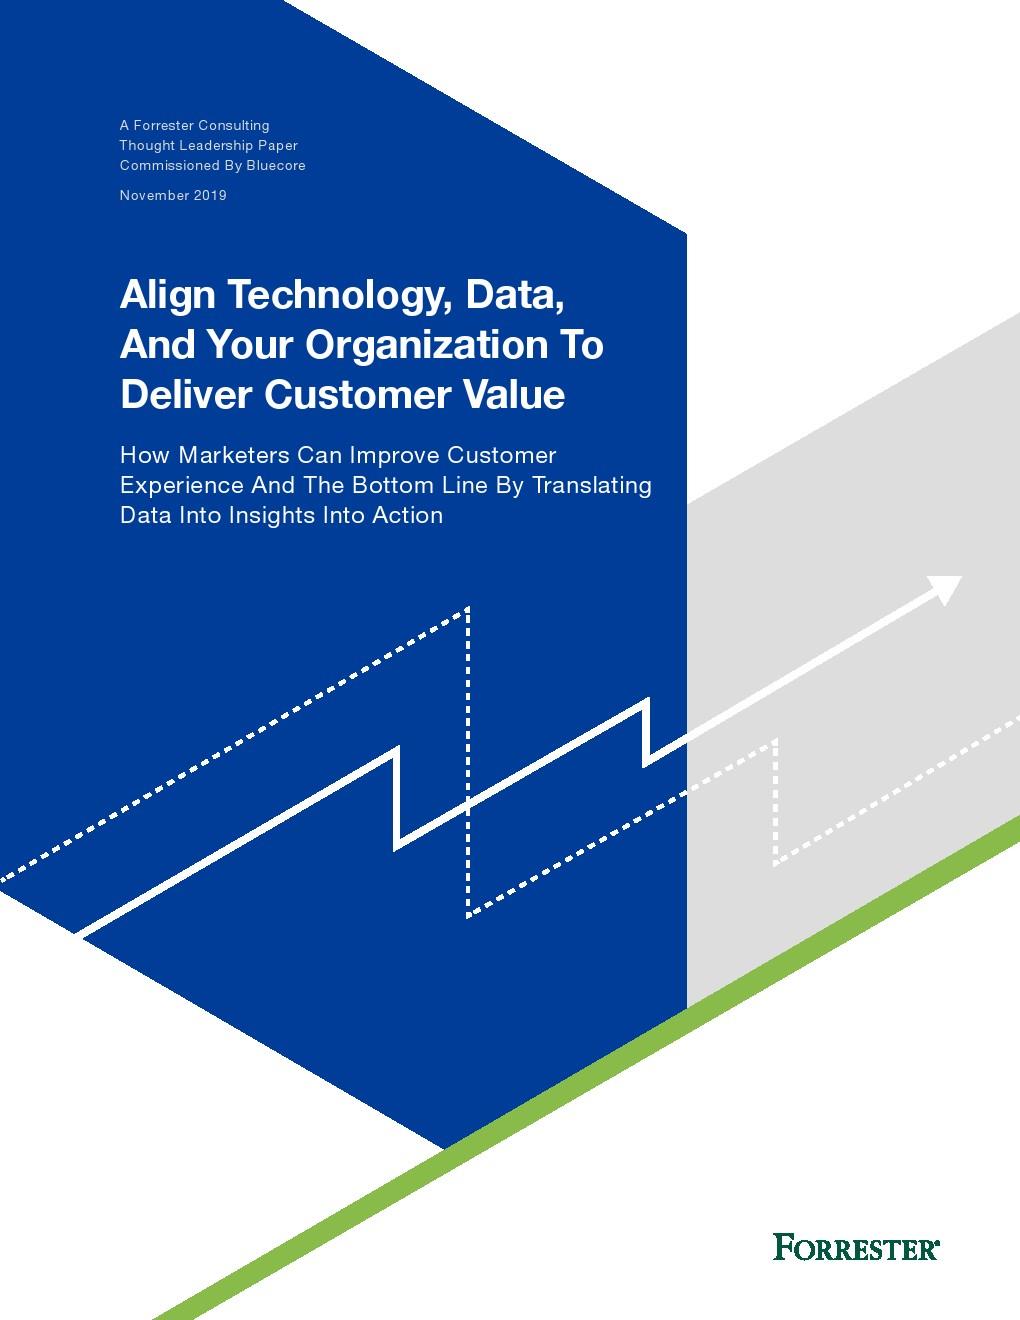 Forrester Consulting:协调科技、数据和组织以提供价值